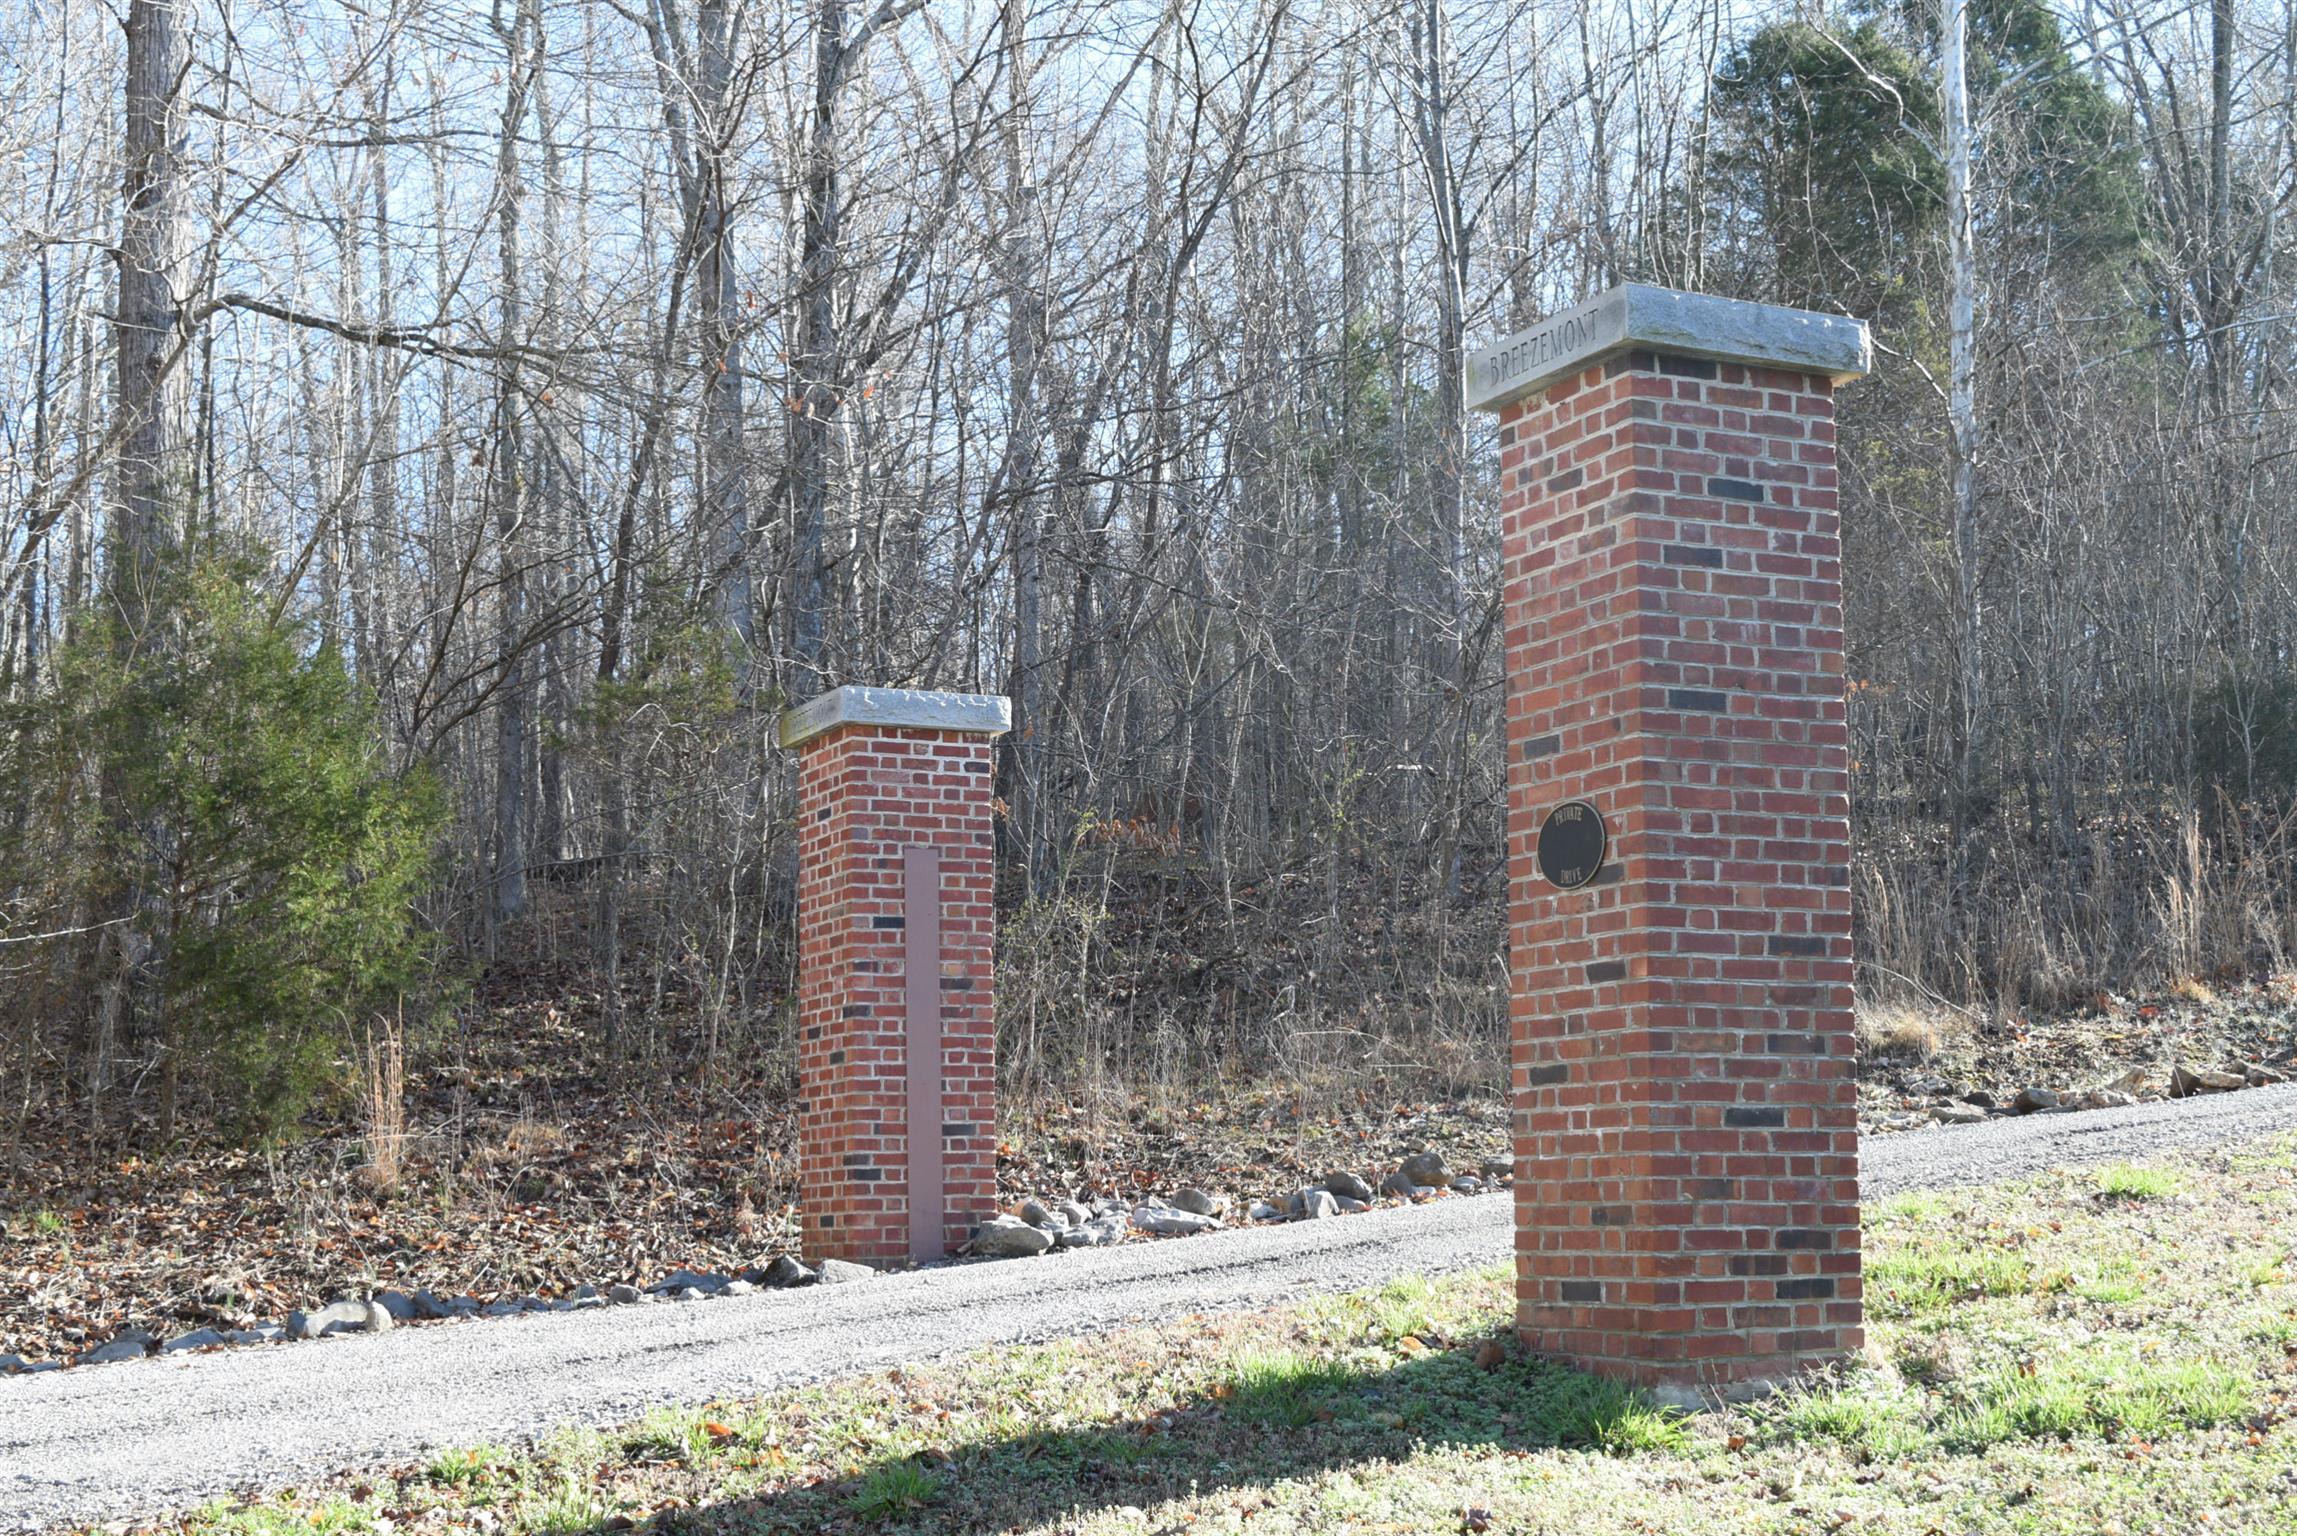 1820 Breezemont Dr, Clarksville, TN 37043 - Clarksville, TN real estate listing